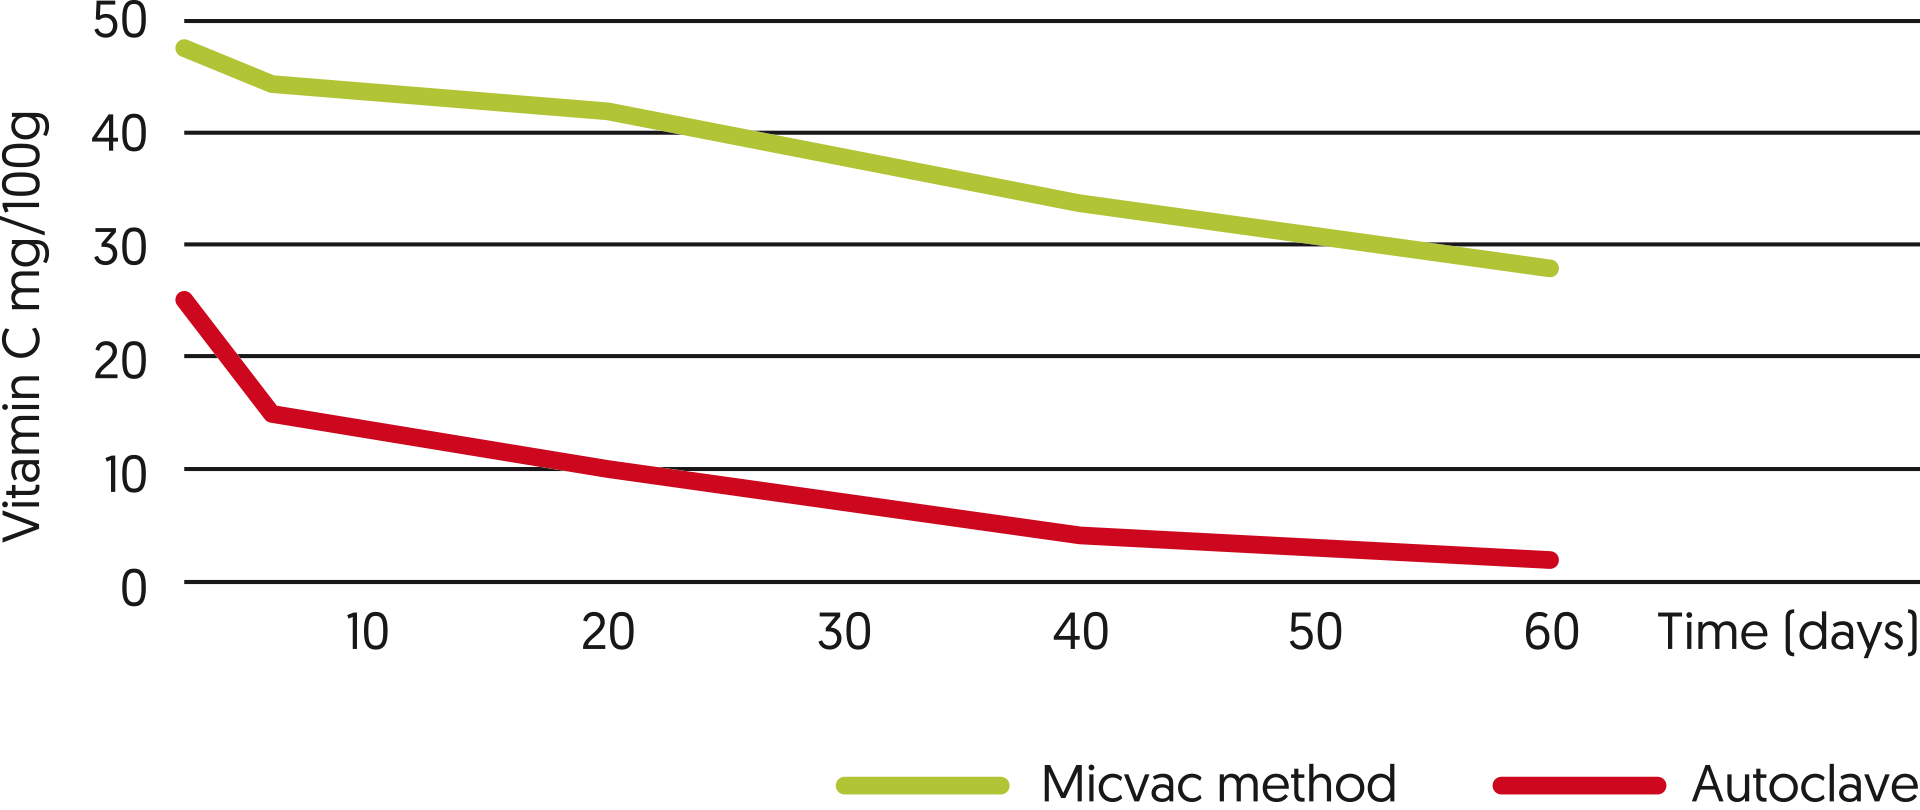 The Micvac-method preserves vitamins far better than competing techniques.